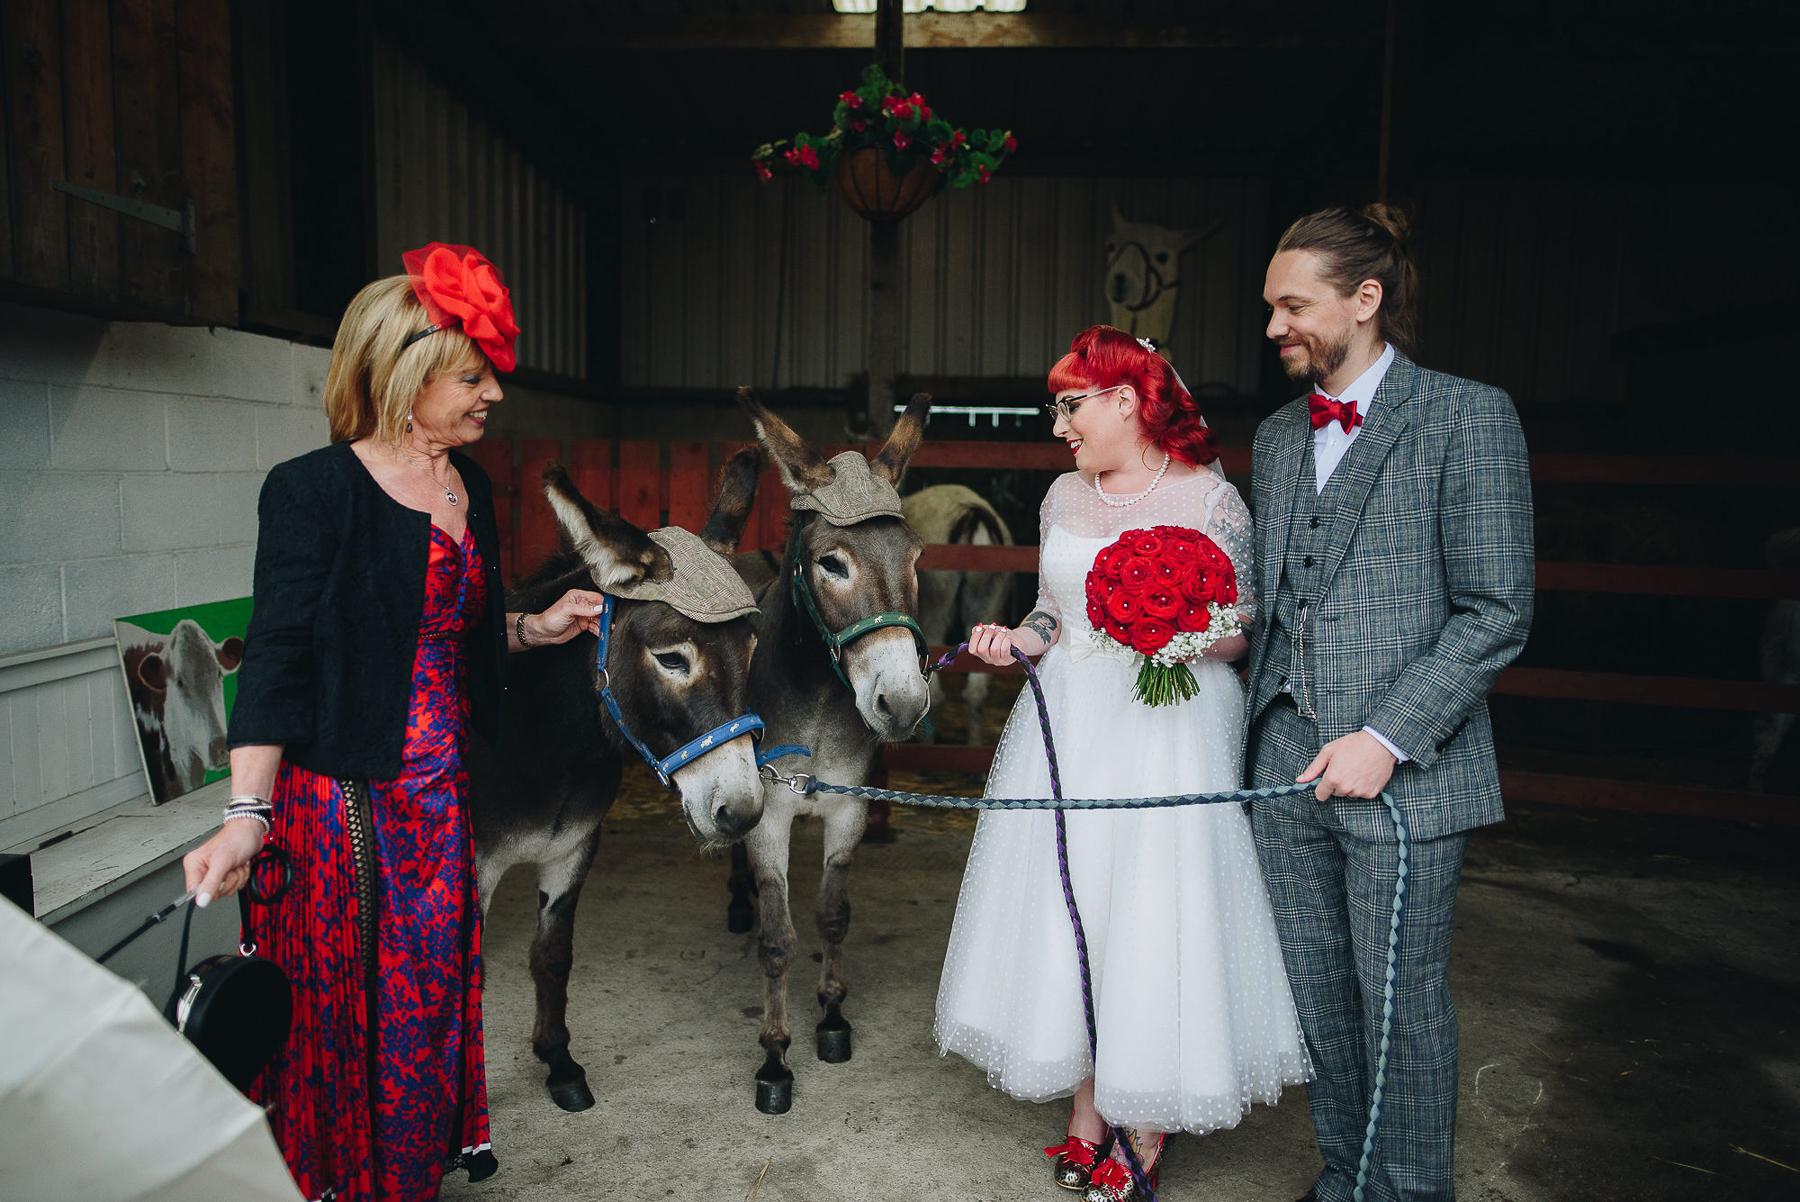 Wellbeing_Farm_Wedding_Photography_The_Pin-Up_Bride_Lara_Shaun-81.jpg